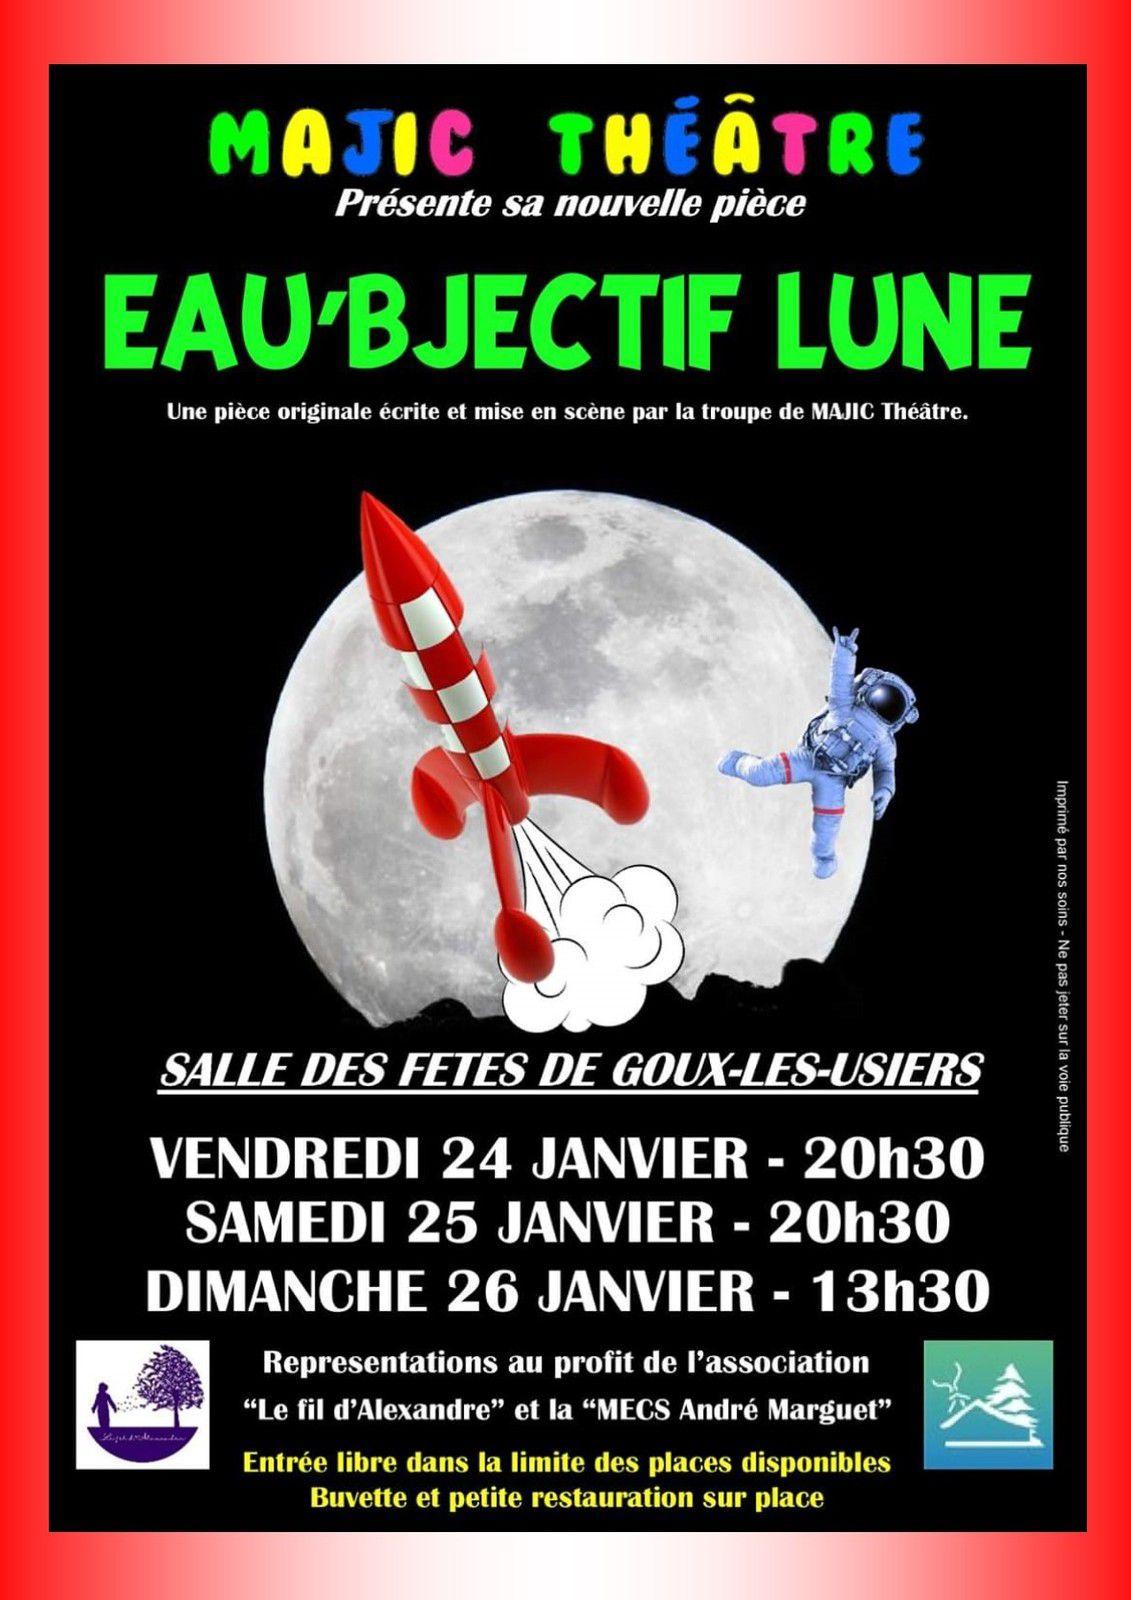 EAU'BJECTIF LUNE - Majic Théâtre